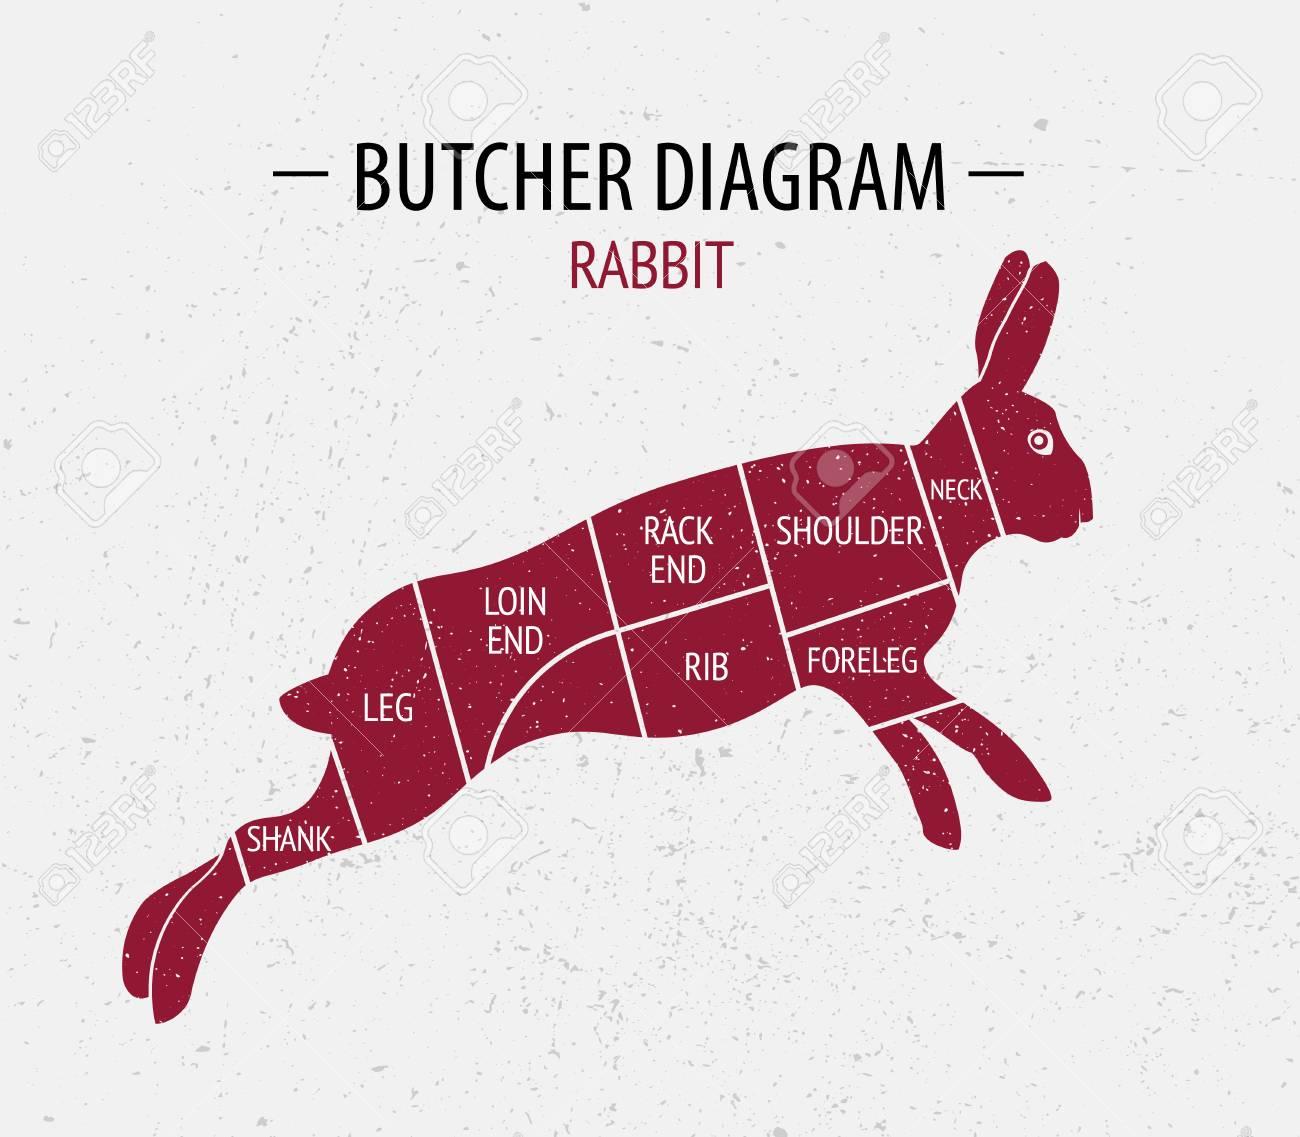 94542374 cut of rabbit poster butcher diagram for groceries meat stores butcher shop farmer market poster for cut of rabbit poster butcher diagram for groceries, meat stores